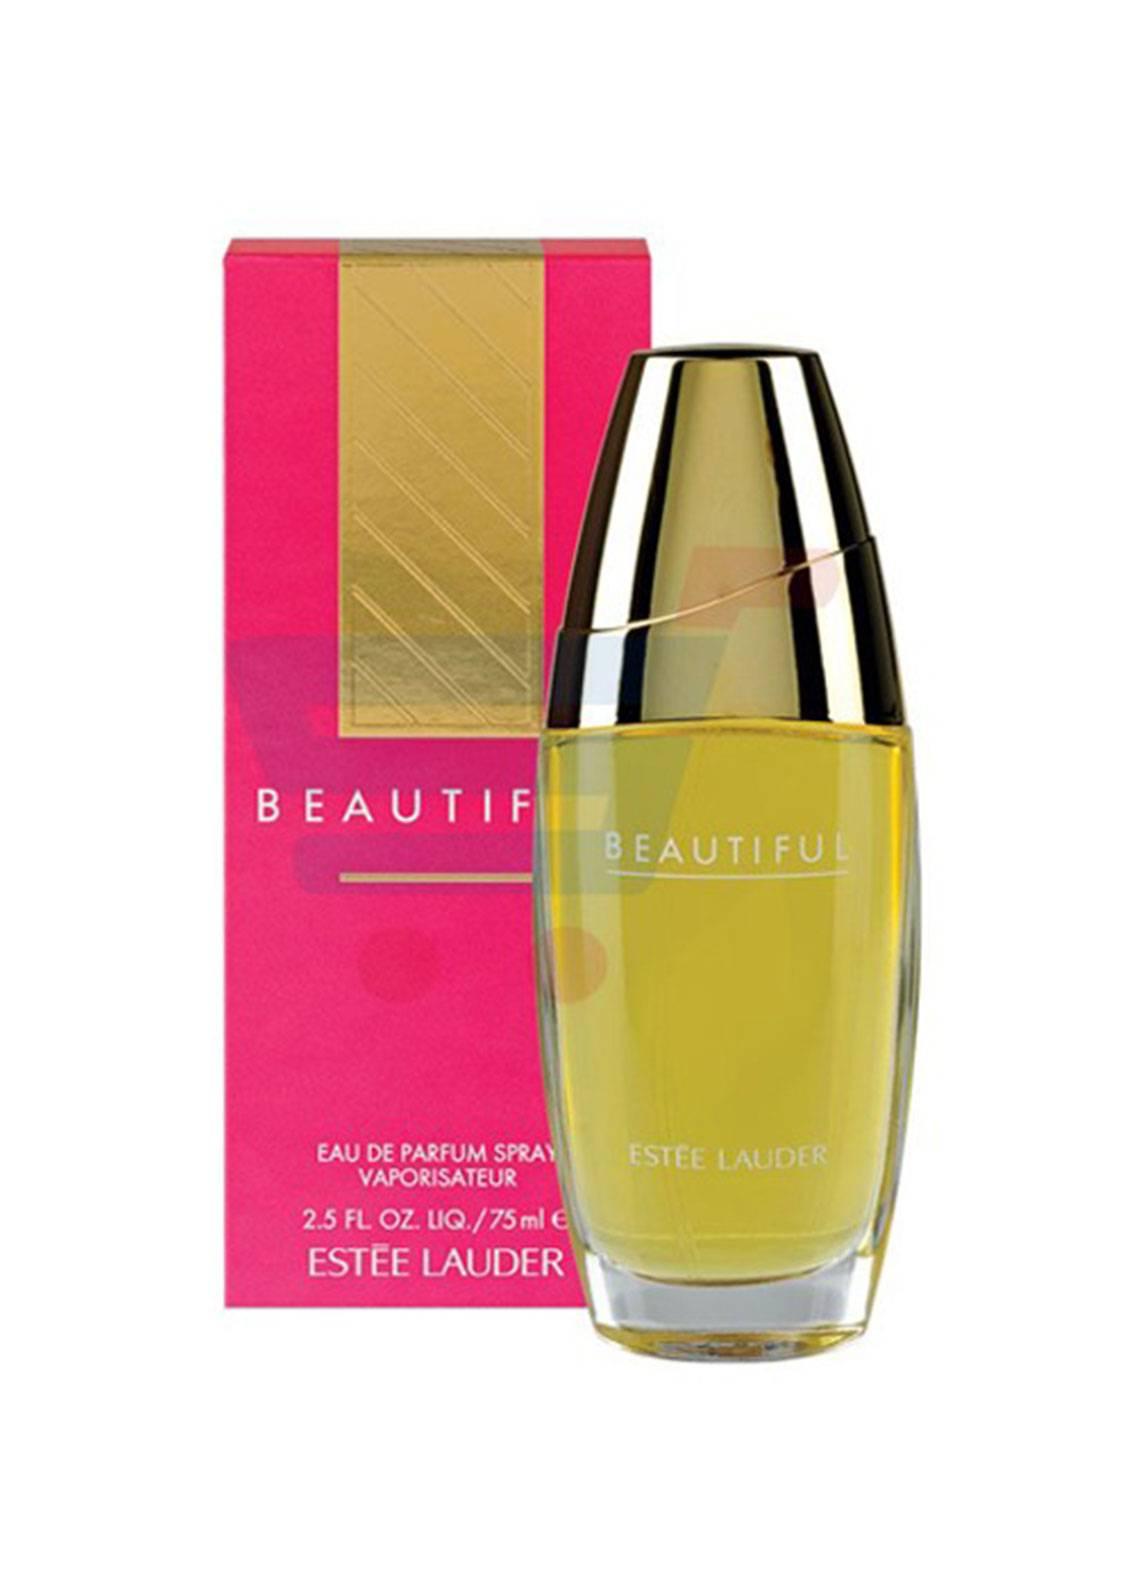 Estee Lauder Beautiful women's perfume EDP